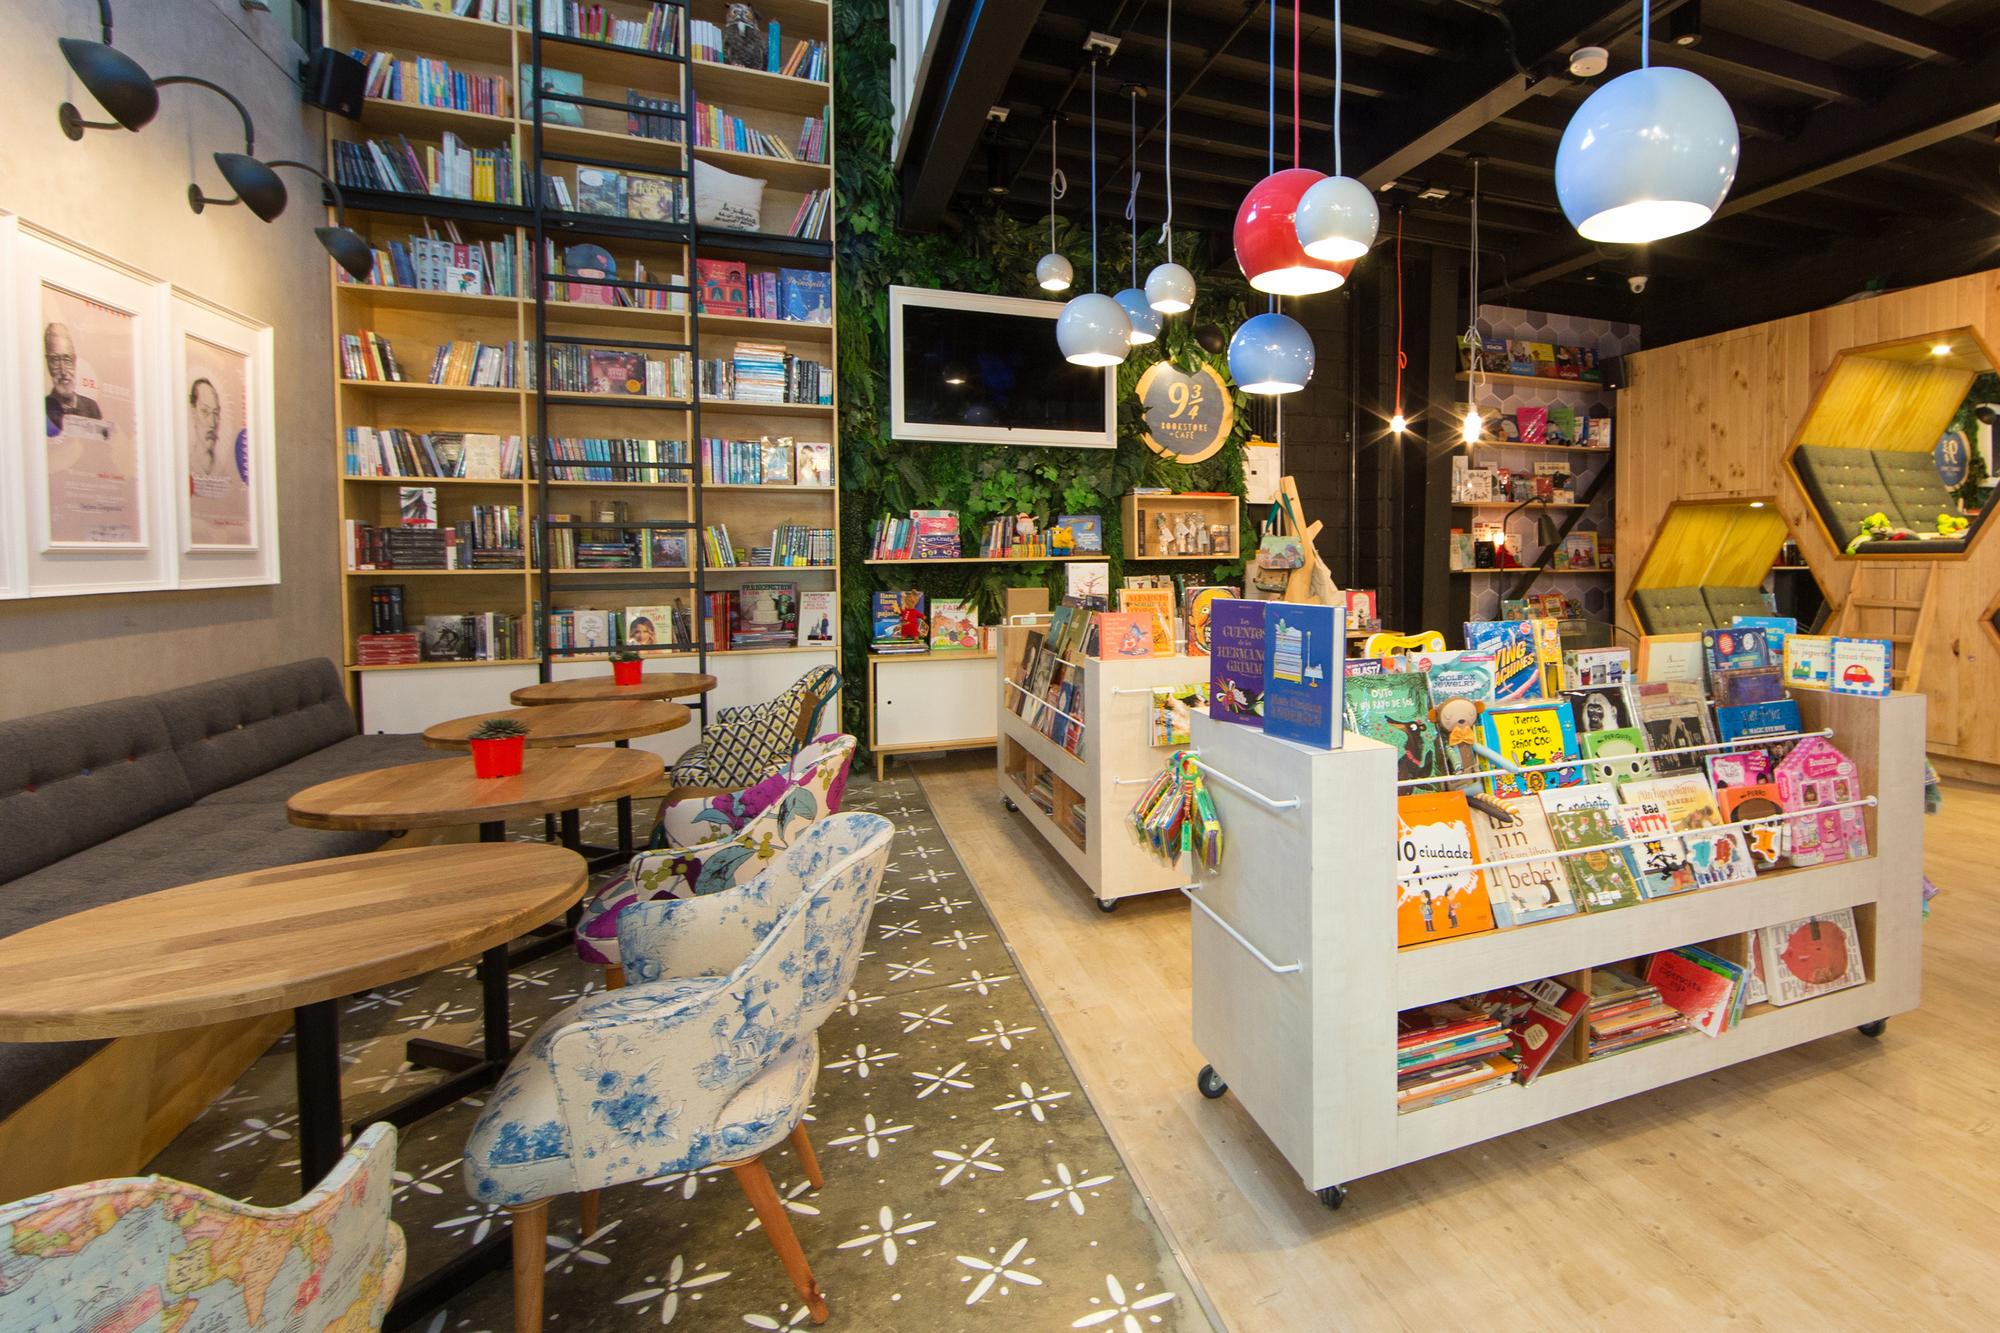 european childrens bookstore conference - HD1348×899